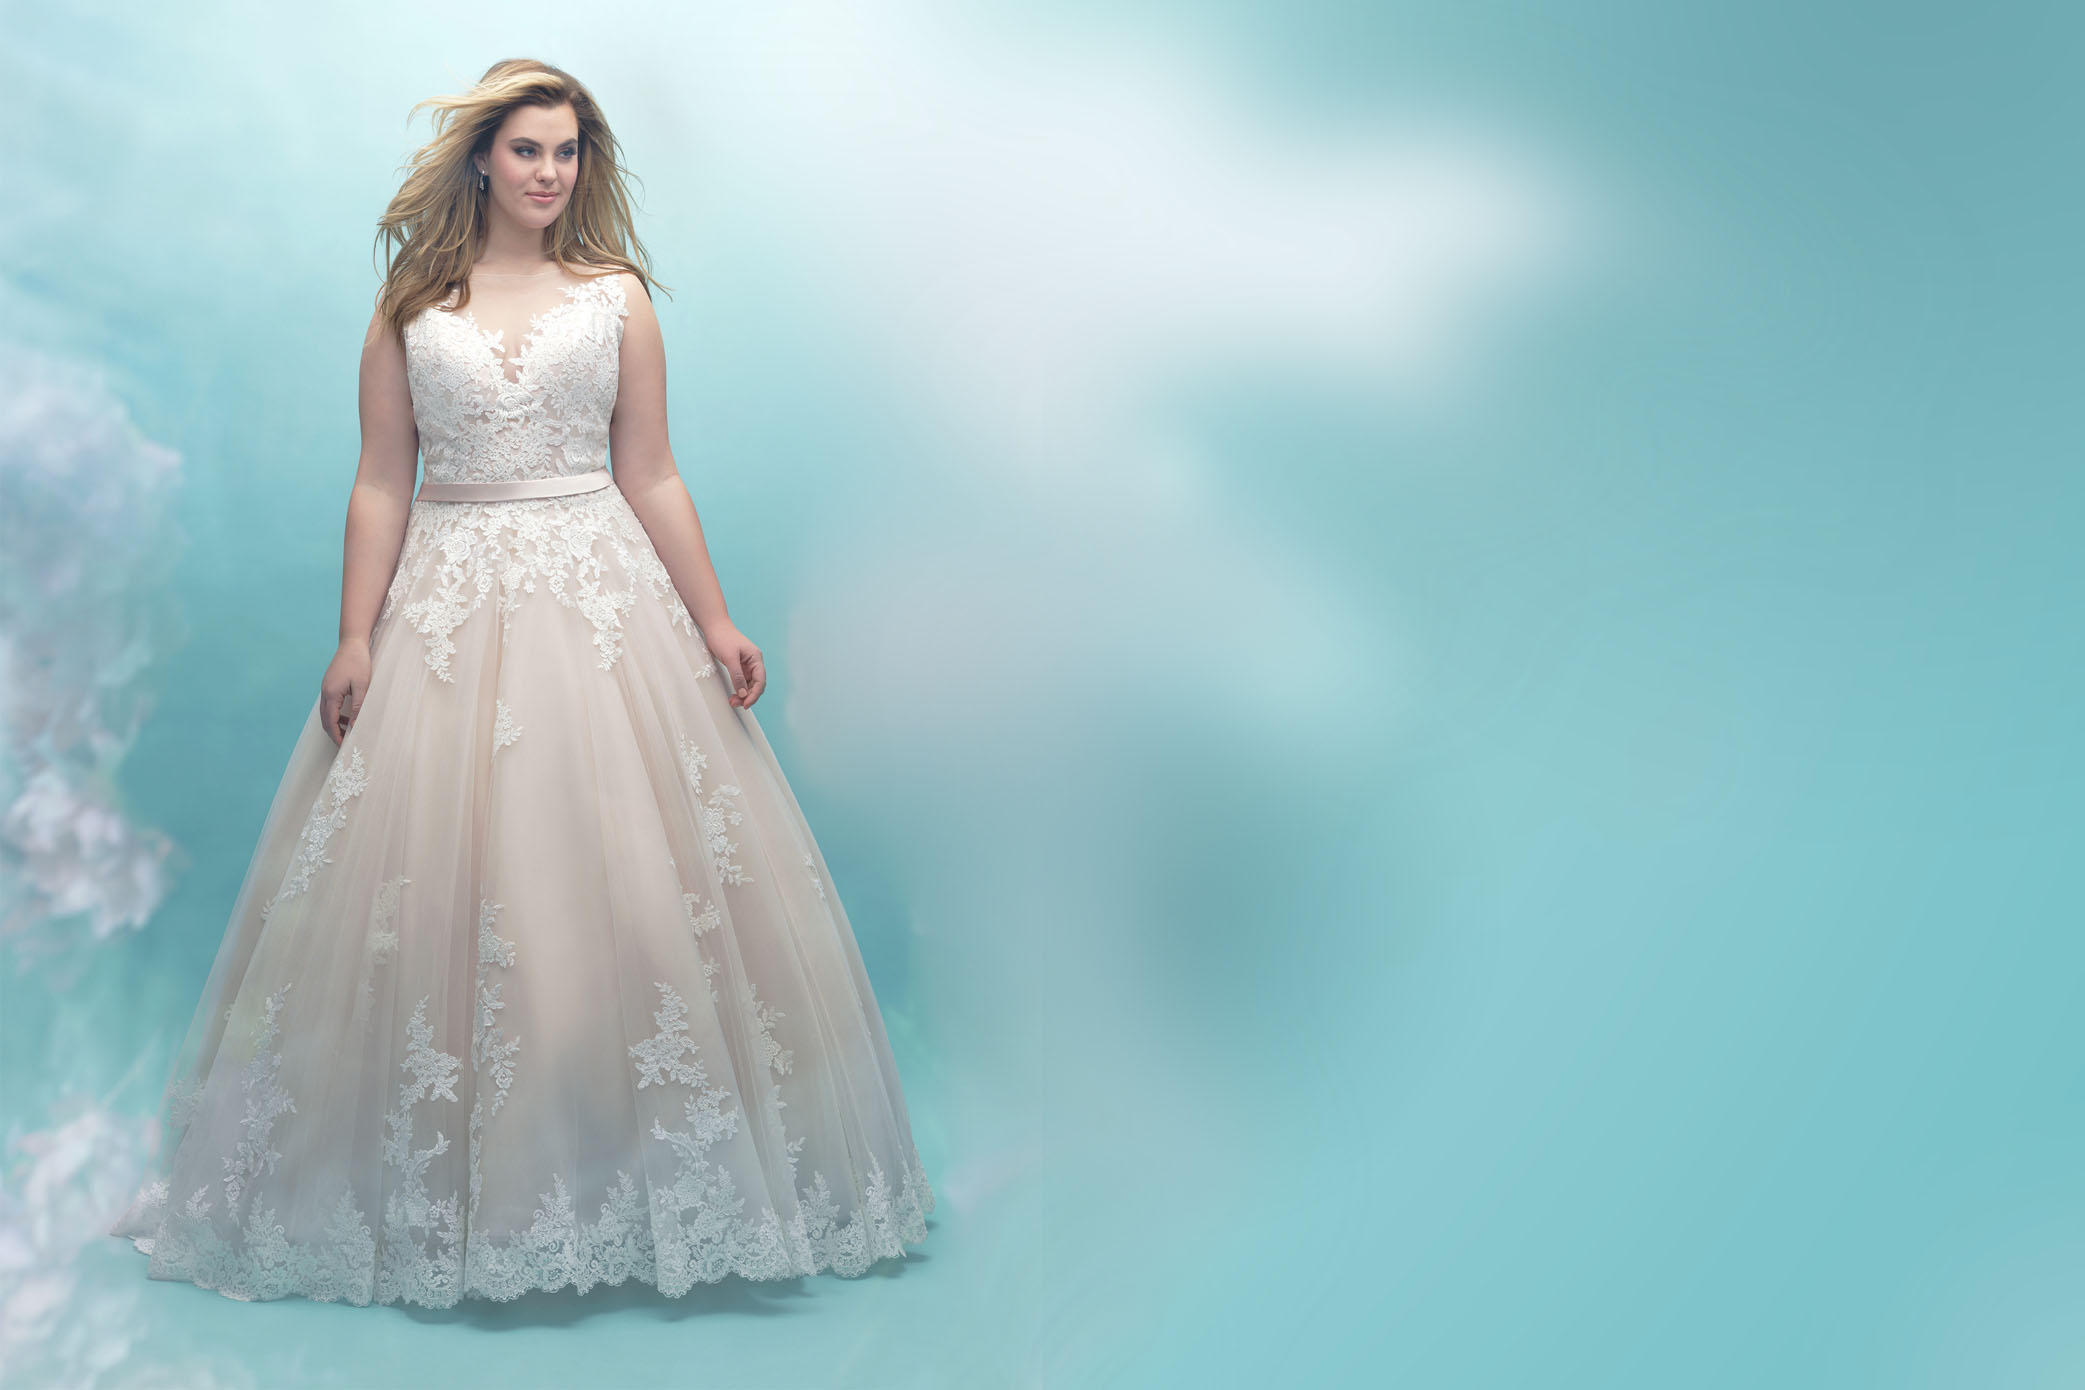 Wedding dresses bridesmaid dresses ma carr bridal buffalo wedding dresses bridesmaid dresses ma carr bridal buffalo rochester and wny716 667 2502 ombrellifo Gallery